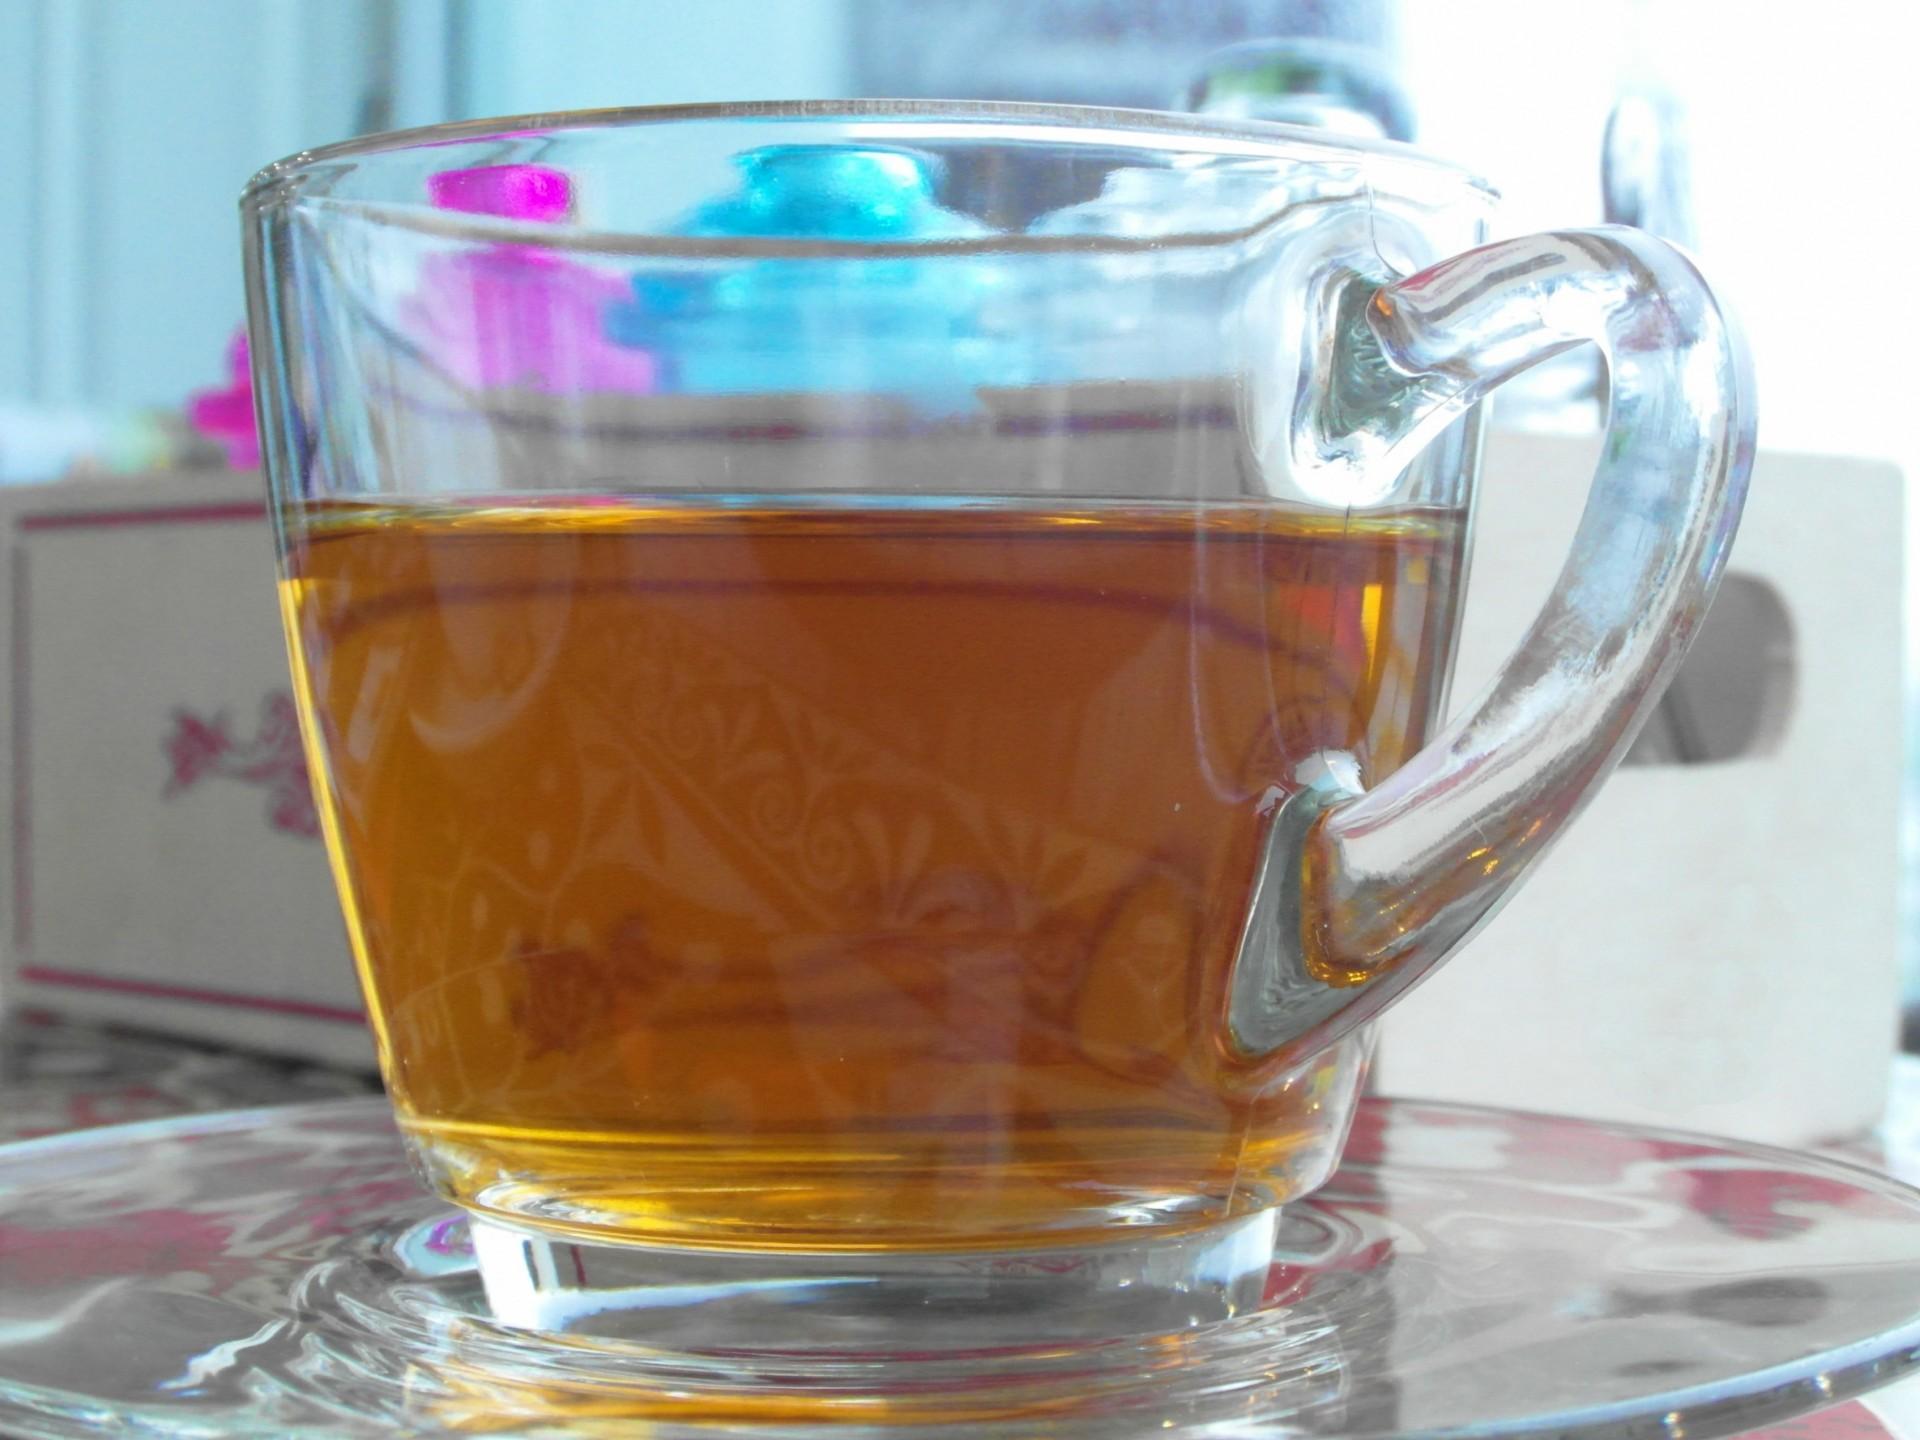 Download Free Photo Of Green Tea Jasmine Healing Healthy From Needpix Com